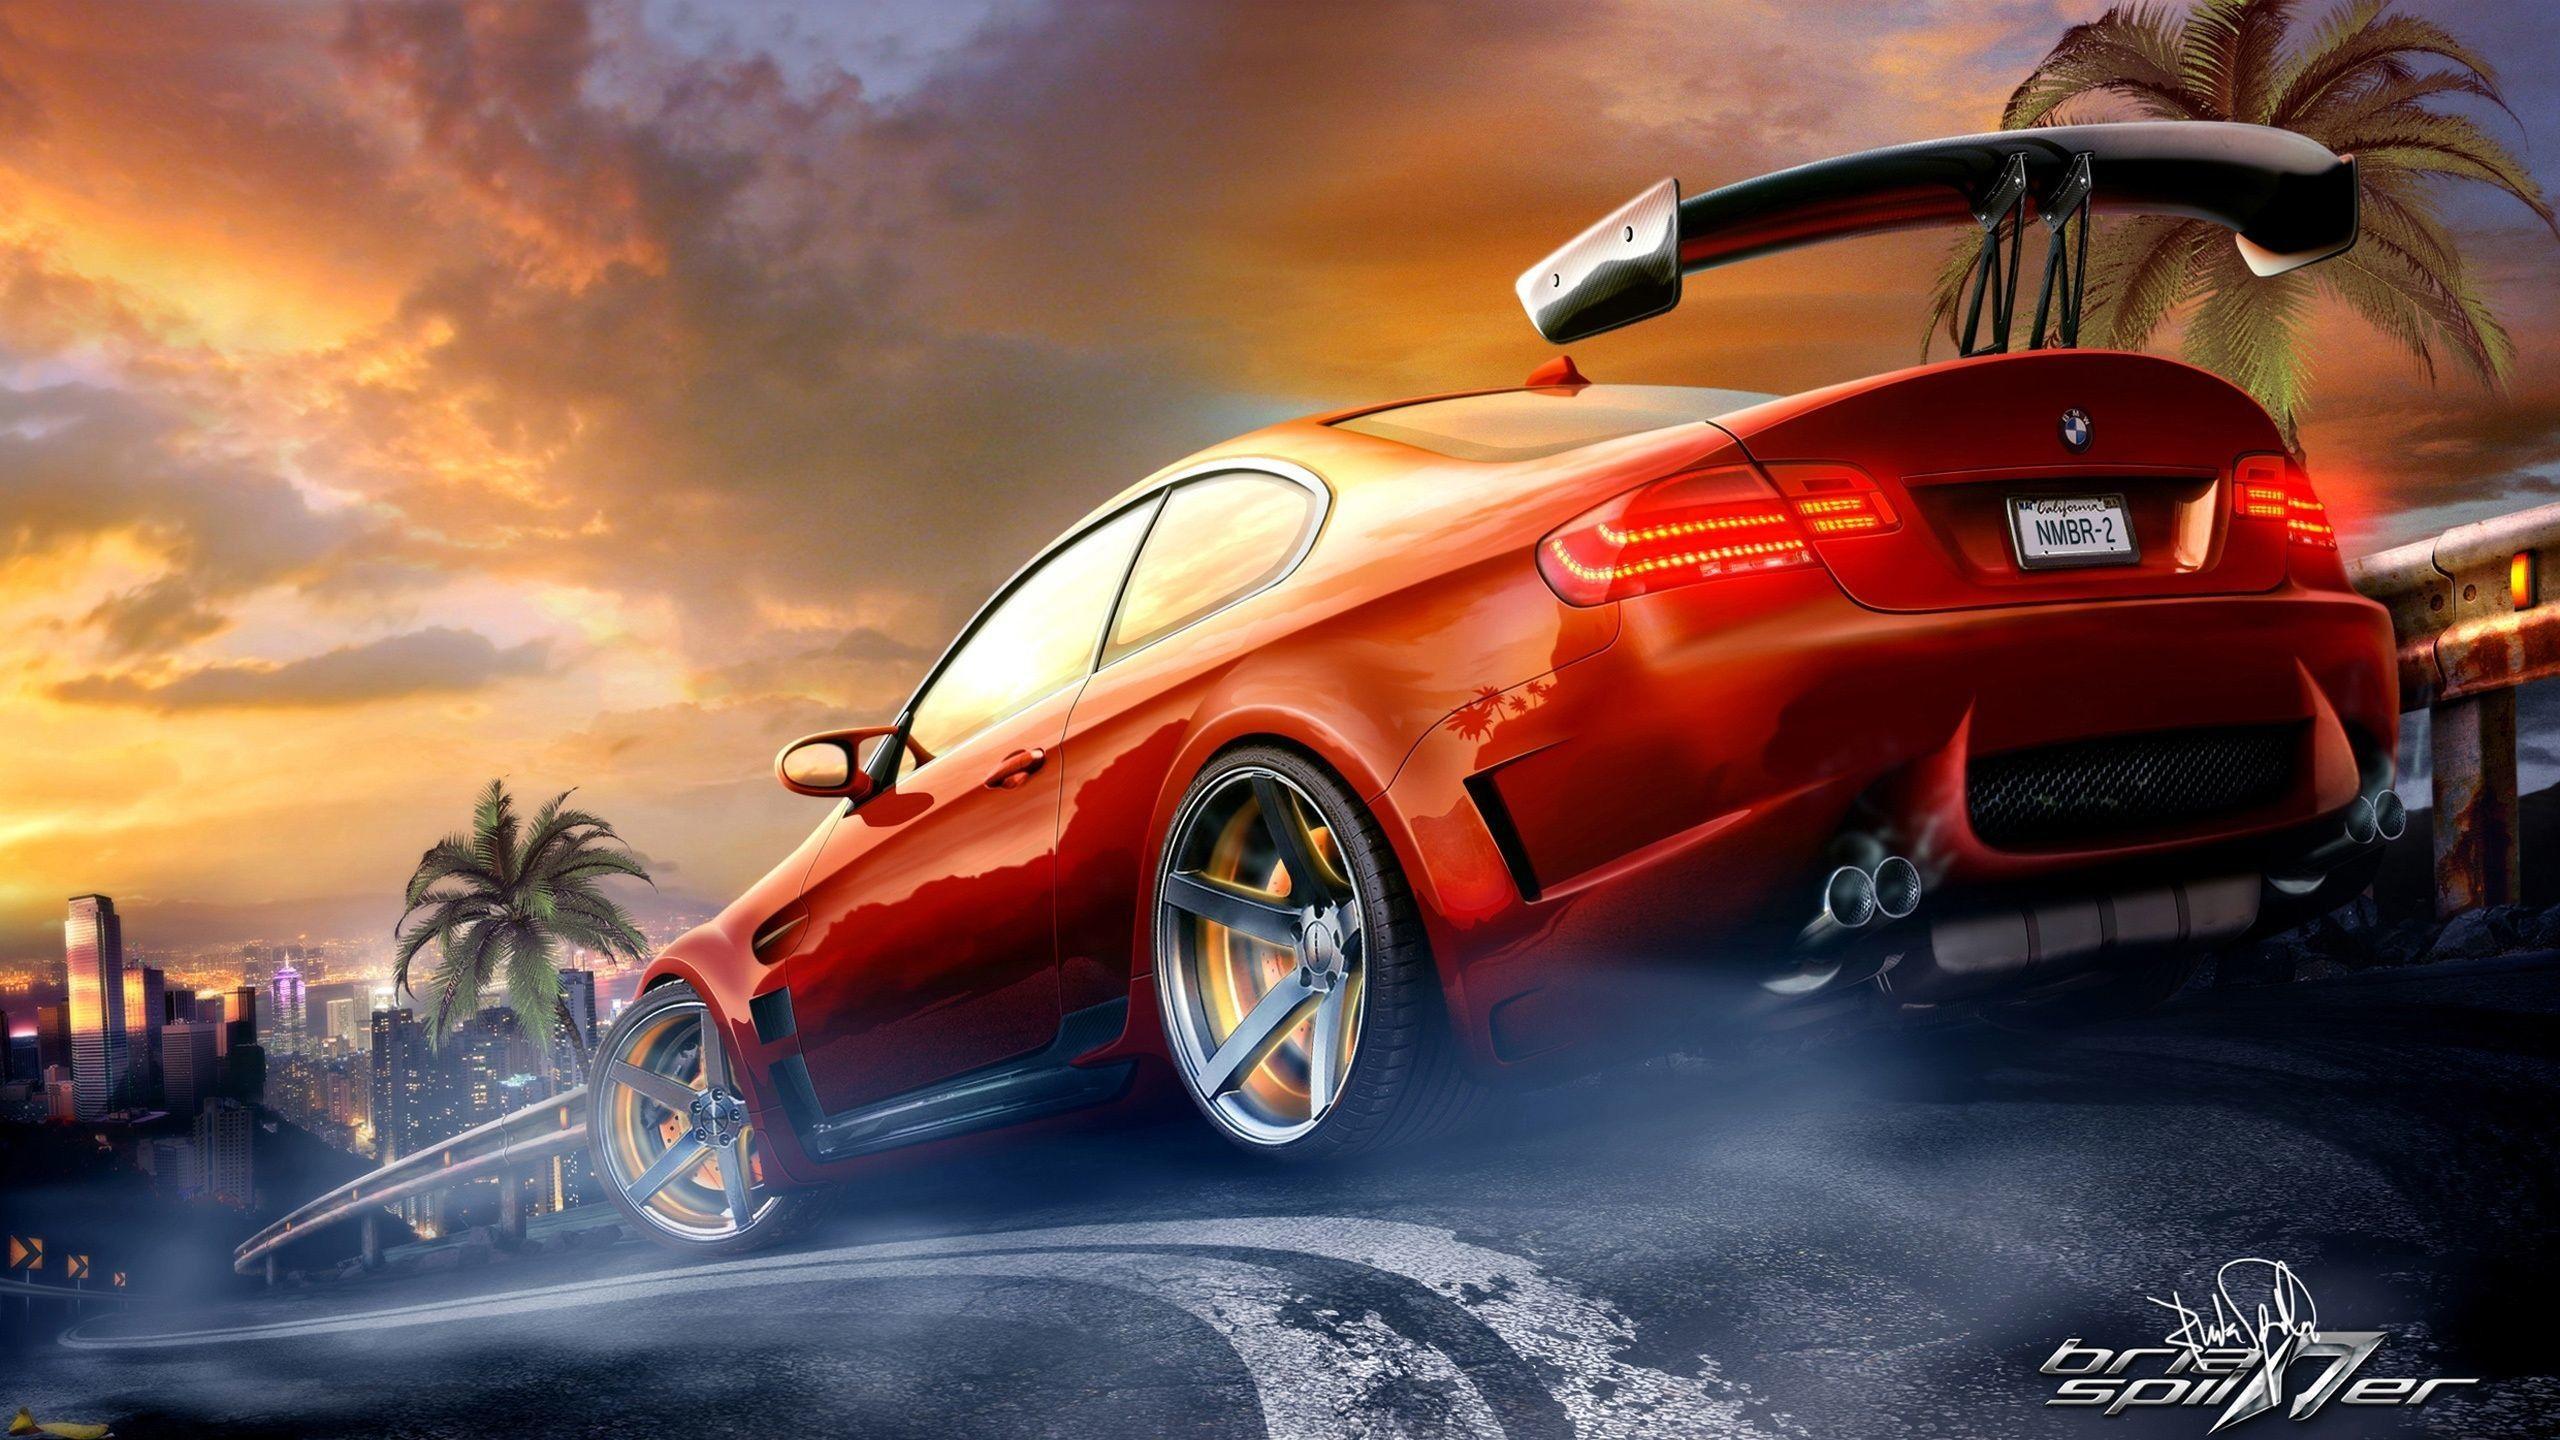 Red Race Car Wallpaper